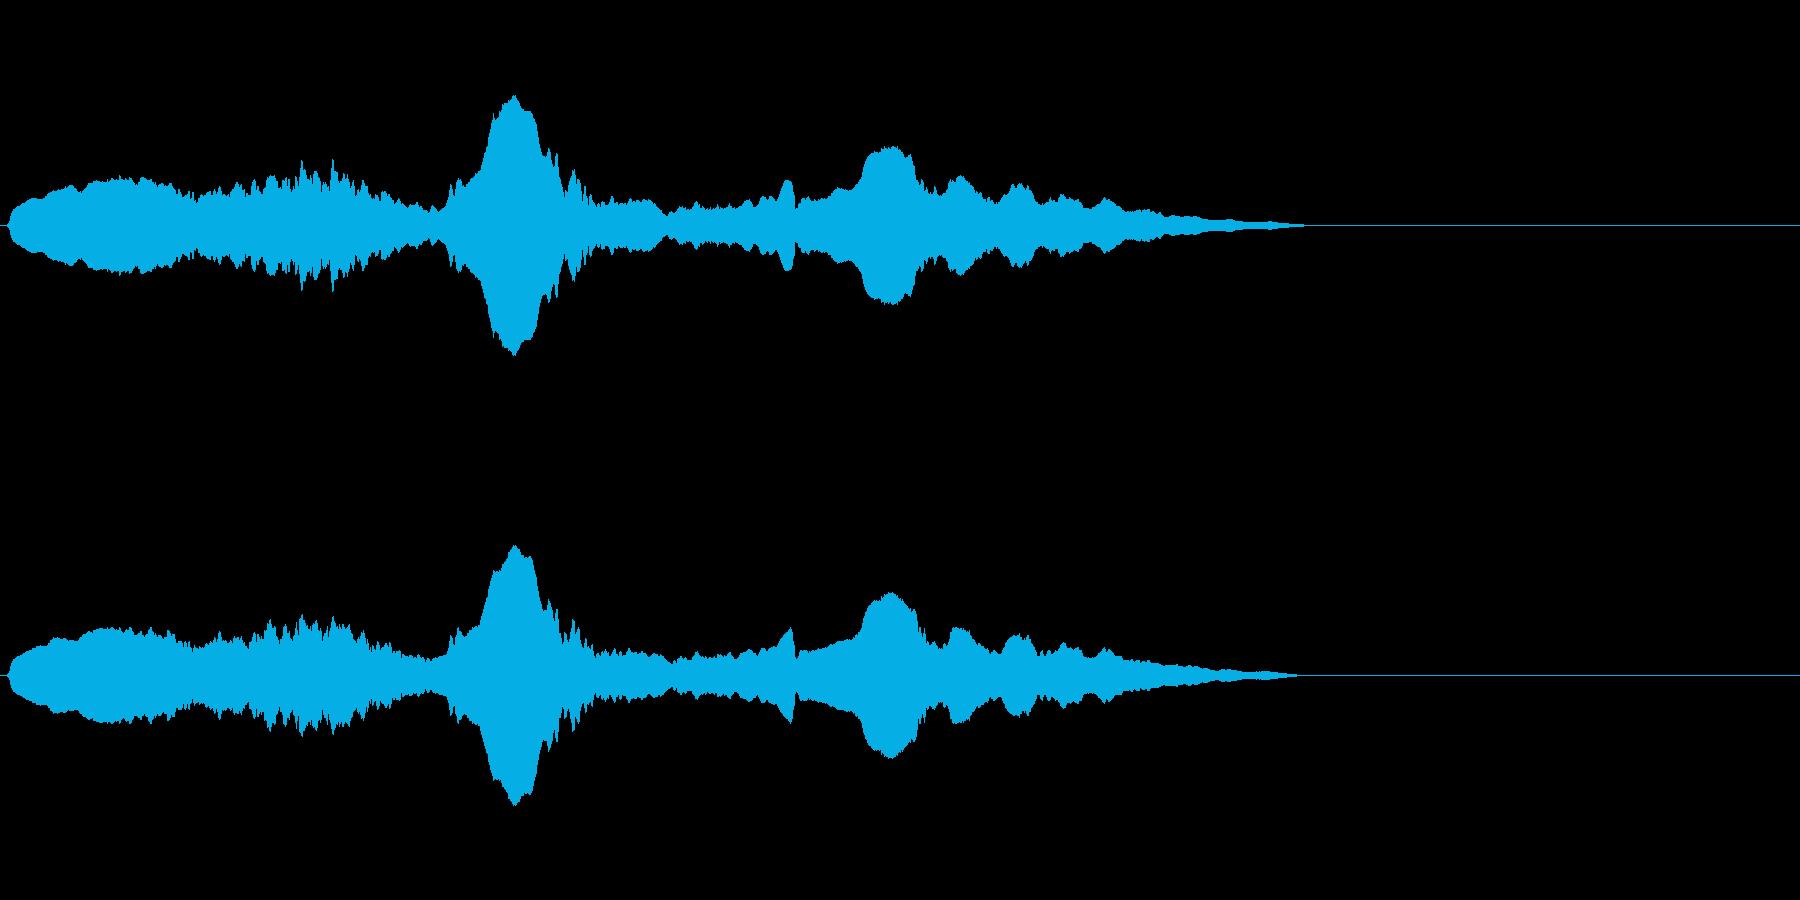 尺八 生演奏 古典風 残響音有 #11の再生済みの波形